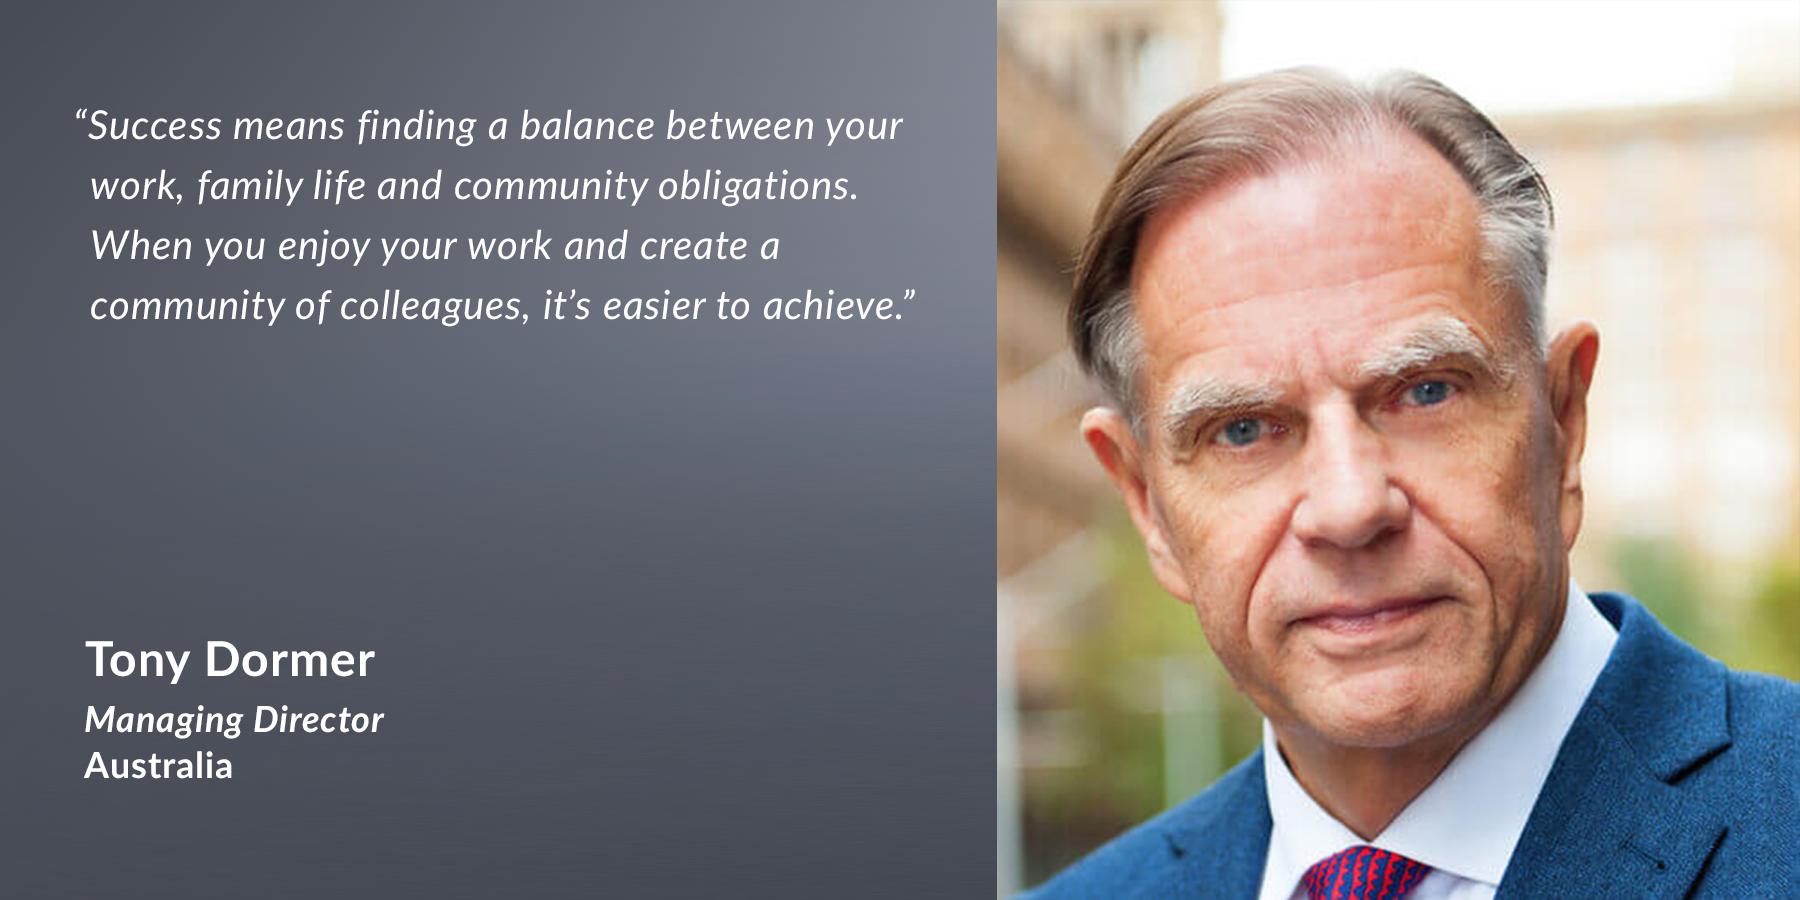 Tony Dormer, Managing Director, Australia